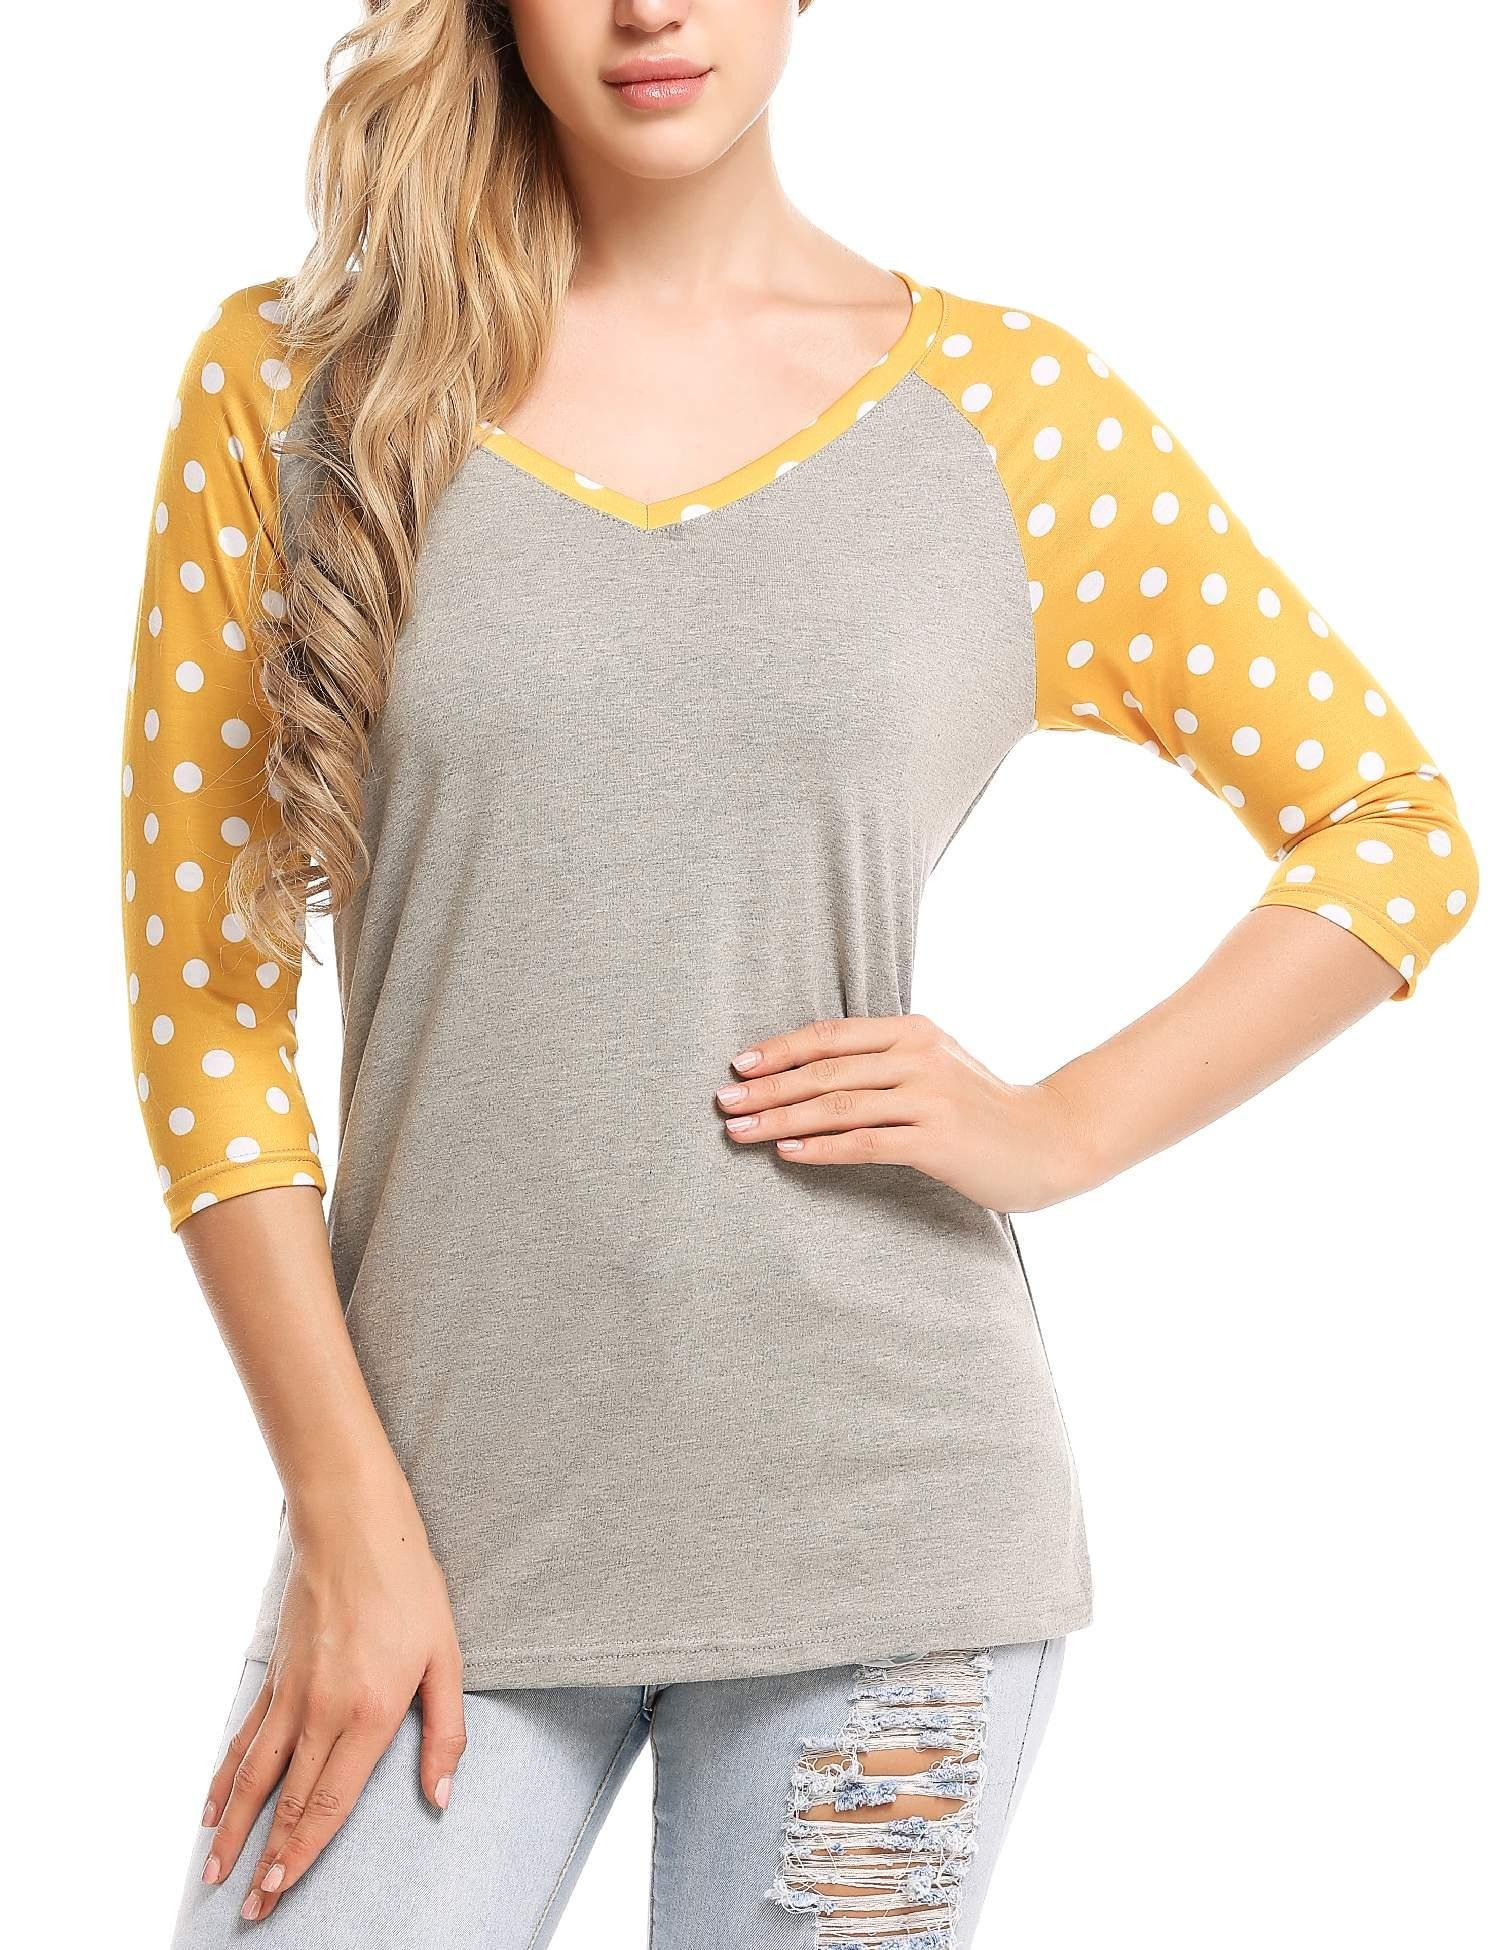 Zeagoo Women Baseball Tee Shirt Dot Tops 3/4 Raglan Sleeves Casual Blouse Yellow M